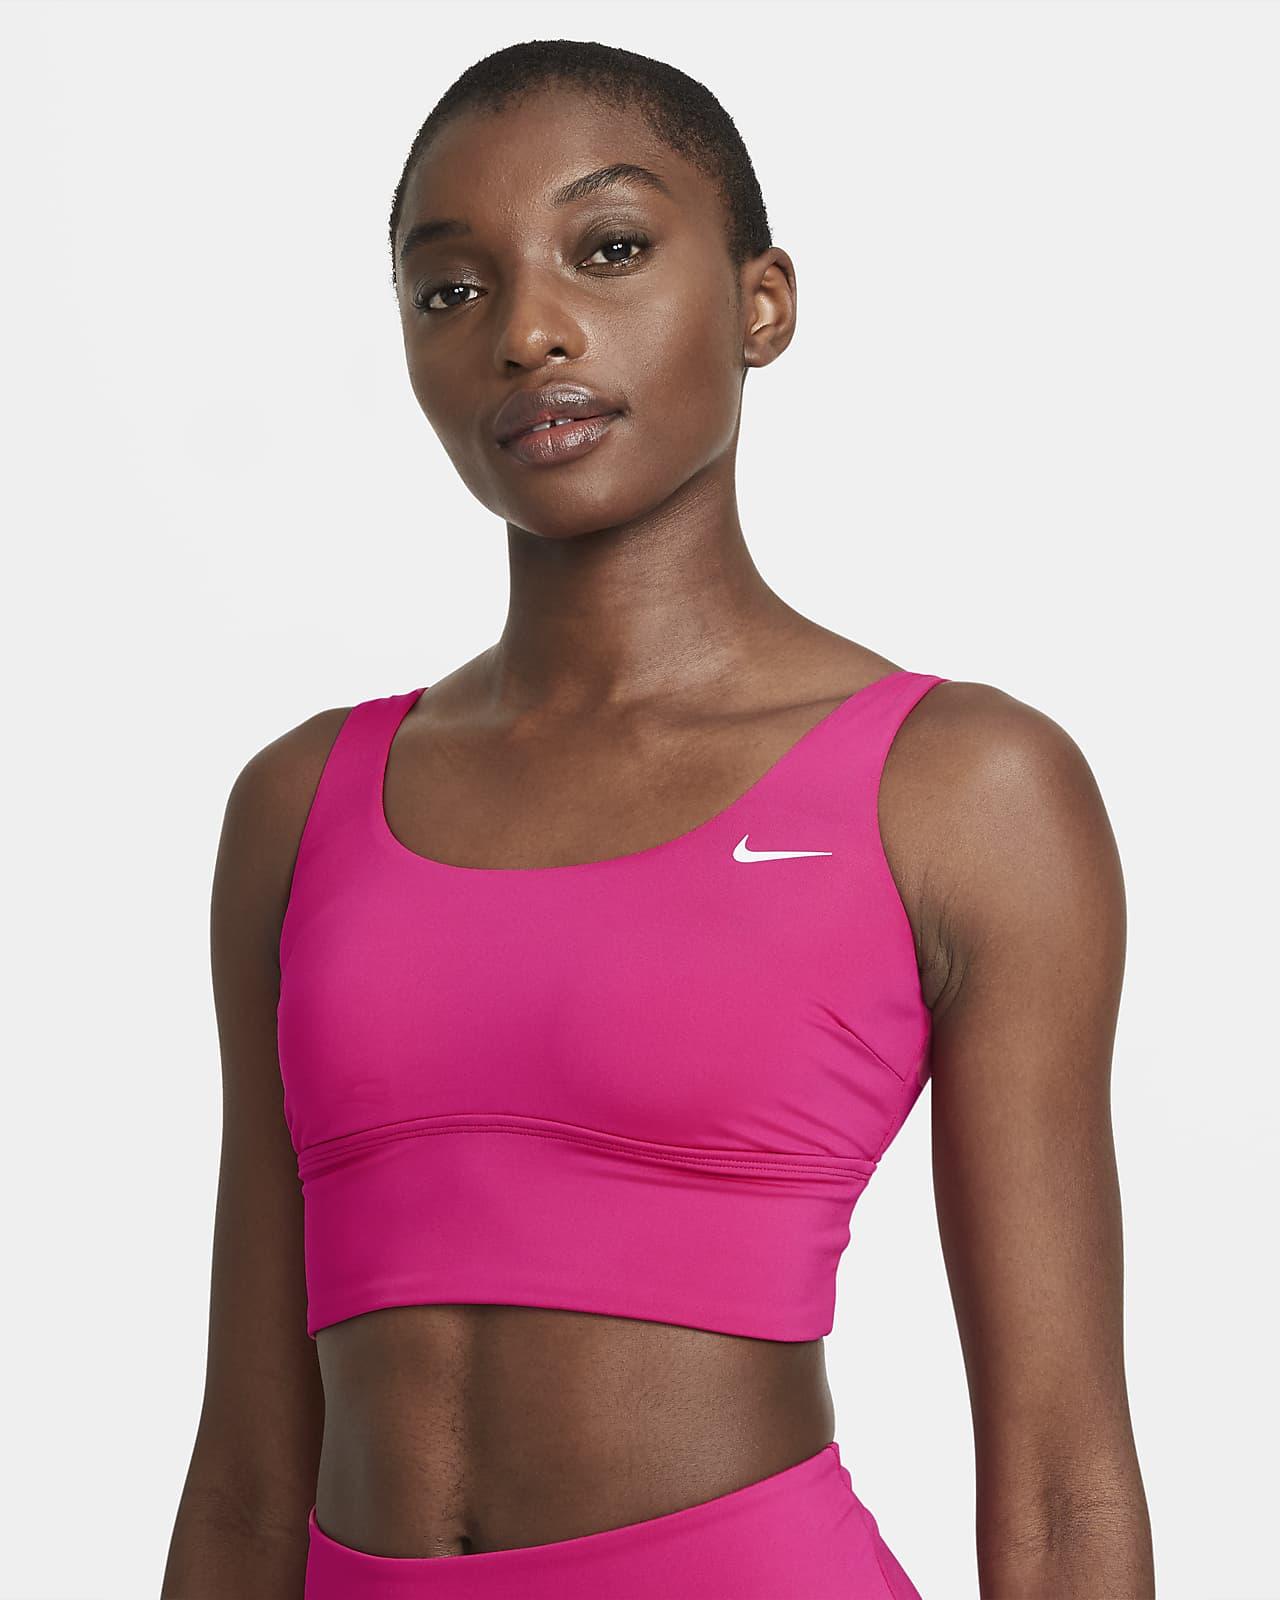 Nike Essential Women's Scoop Neck Midkini Swim Top